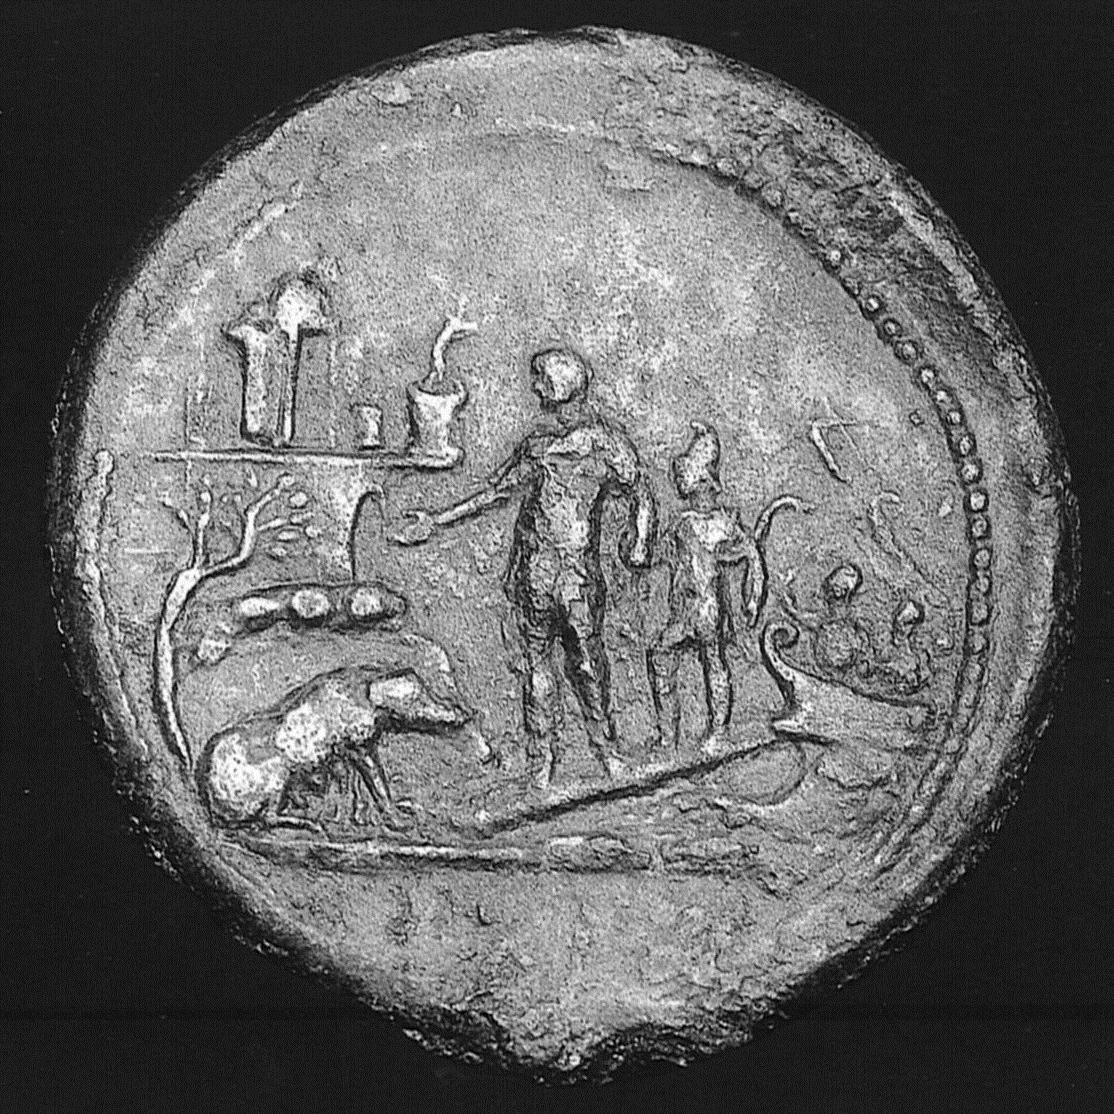 Antiquites Romaines Tome 1 Introduction Generale Et Livre I